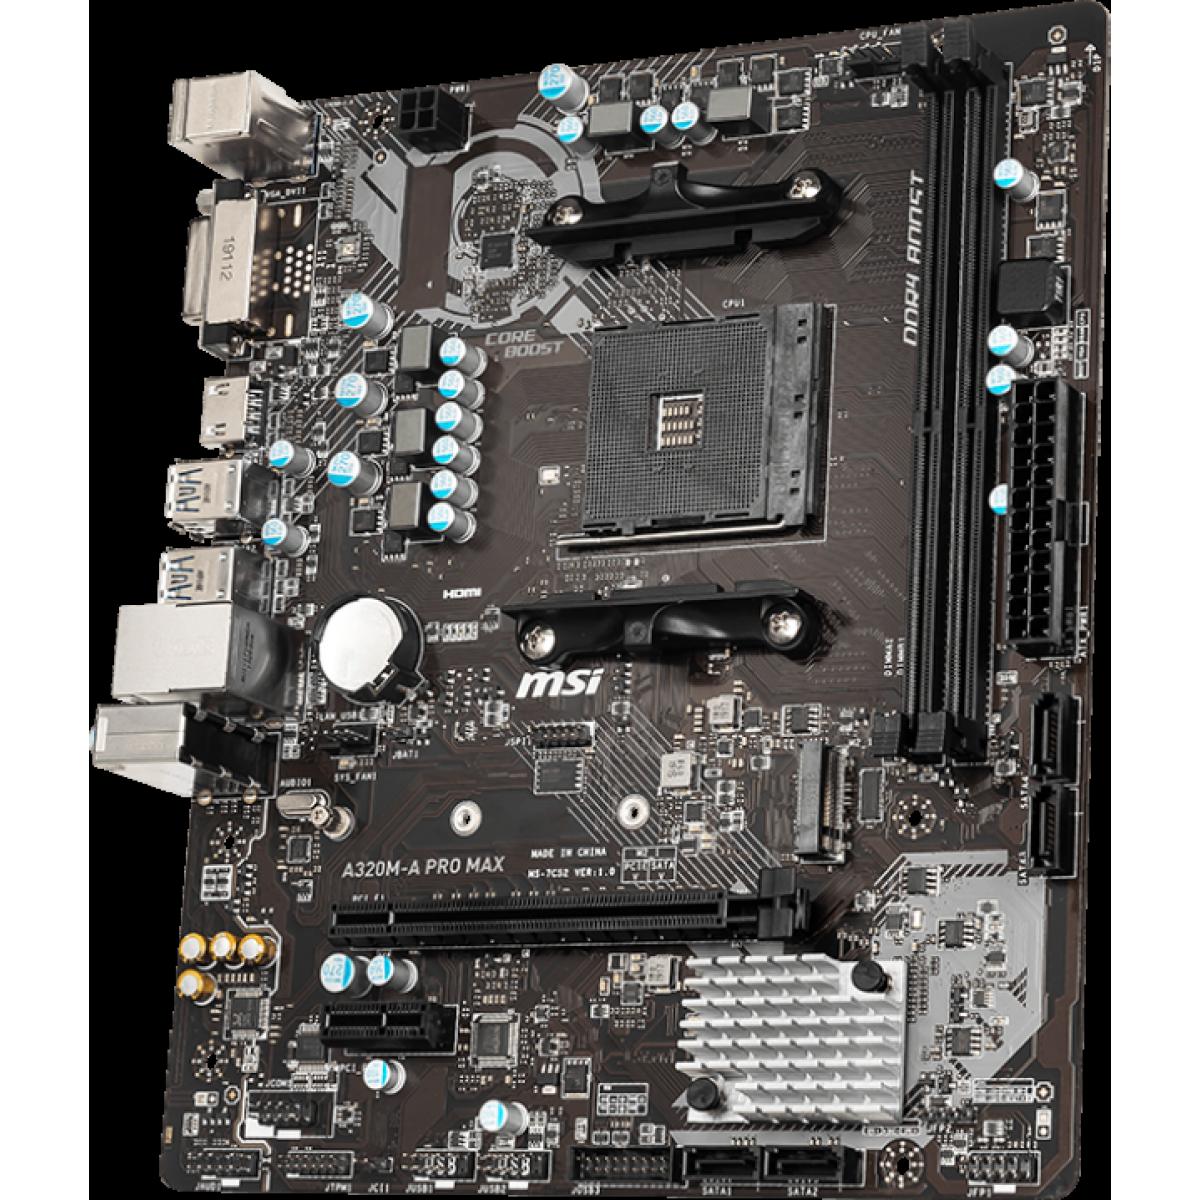 Placa Mãe MSI A320M-A Pro Max, Chipset A320, AMD AM4, mATX, DDR4